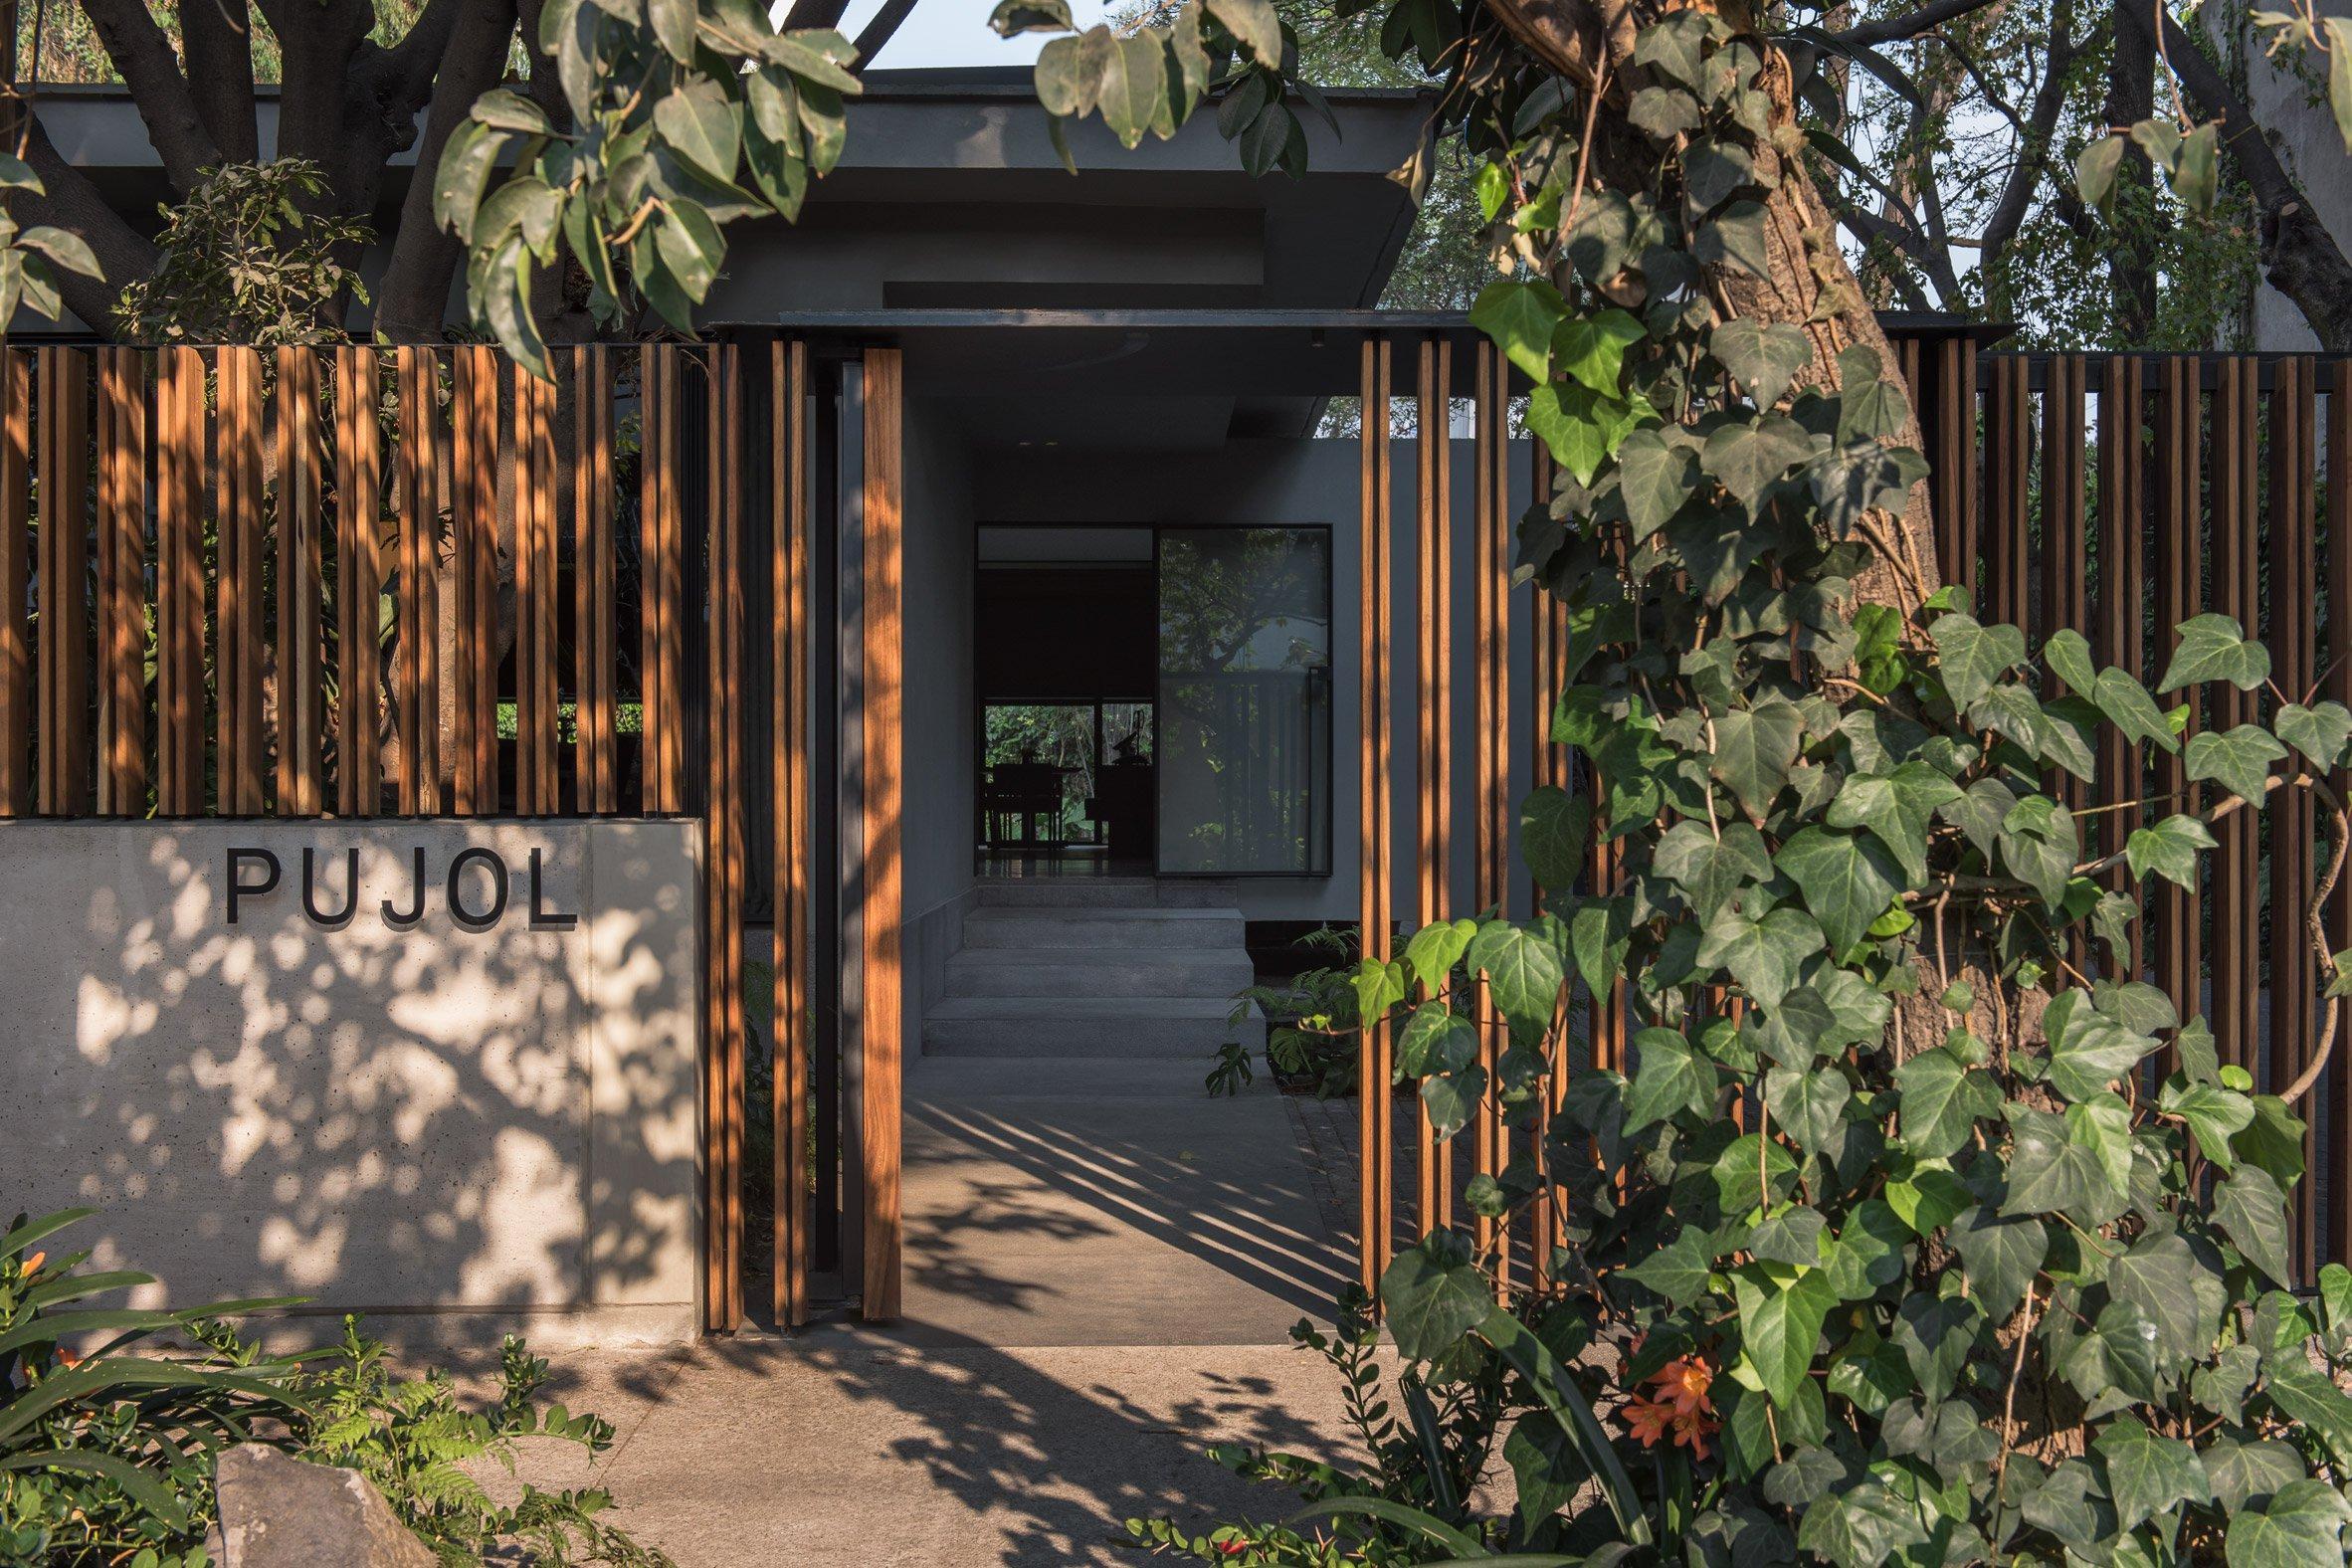 architecture-pujol-restaurant-interiors-design-studia-osnovadesign-osnova-poltava_08